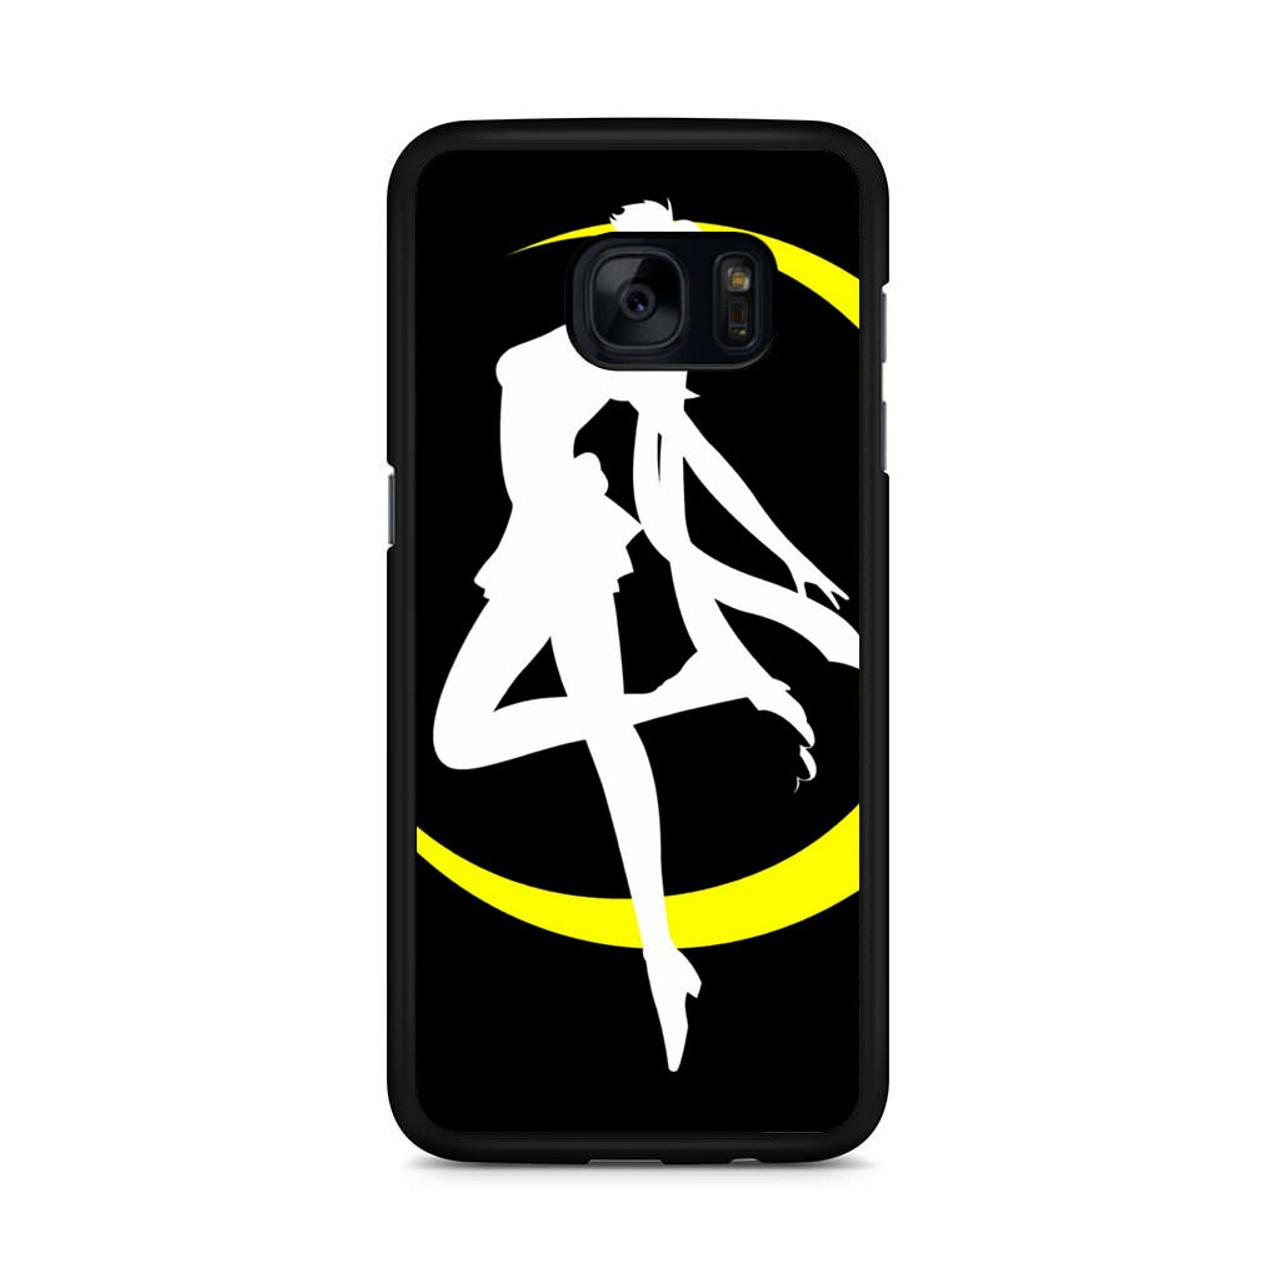 sports shoes 5a95d 77b93 Anime Sailor Moon Samsung Galaxy S7 Edge Case